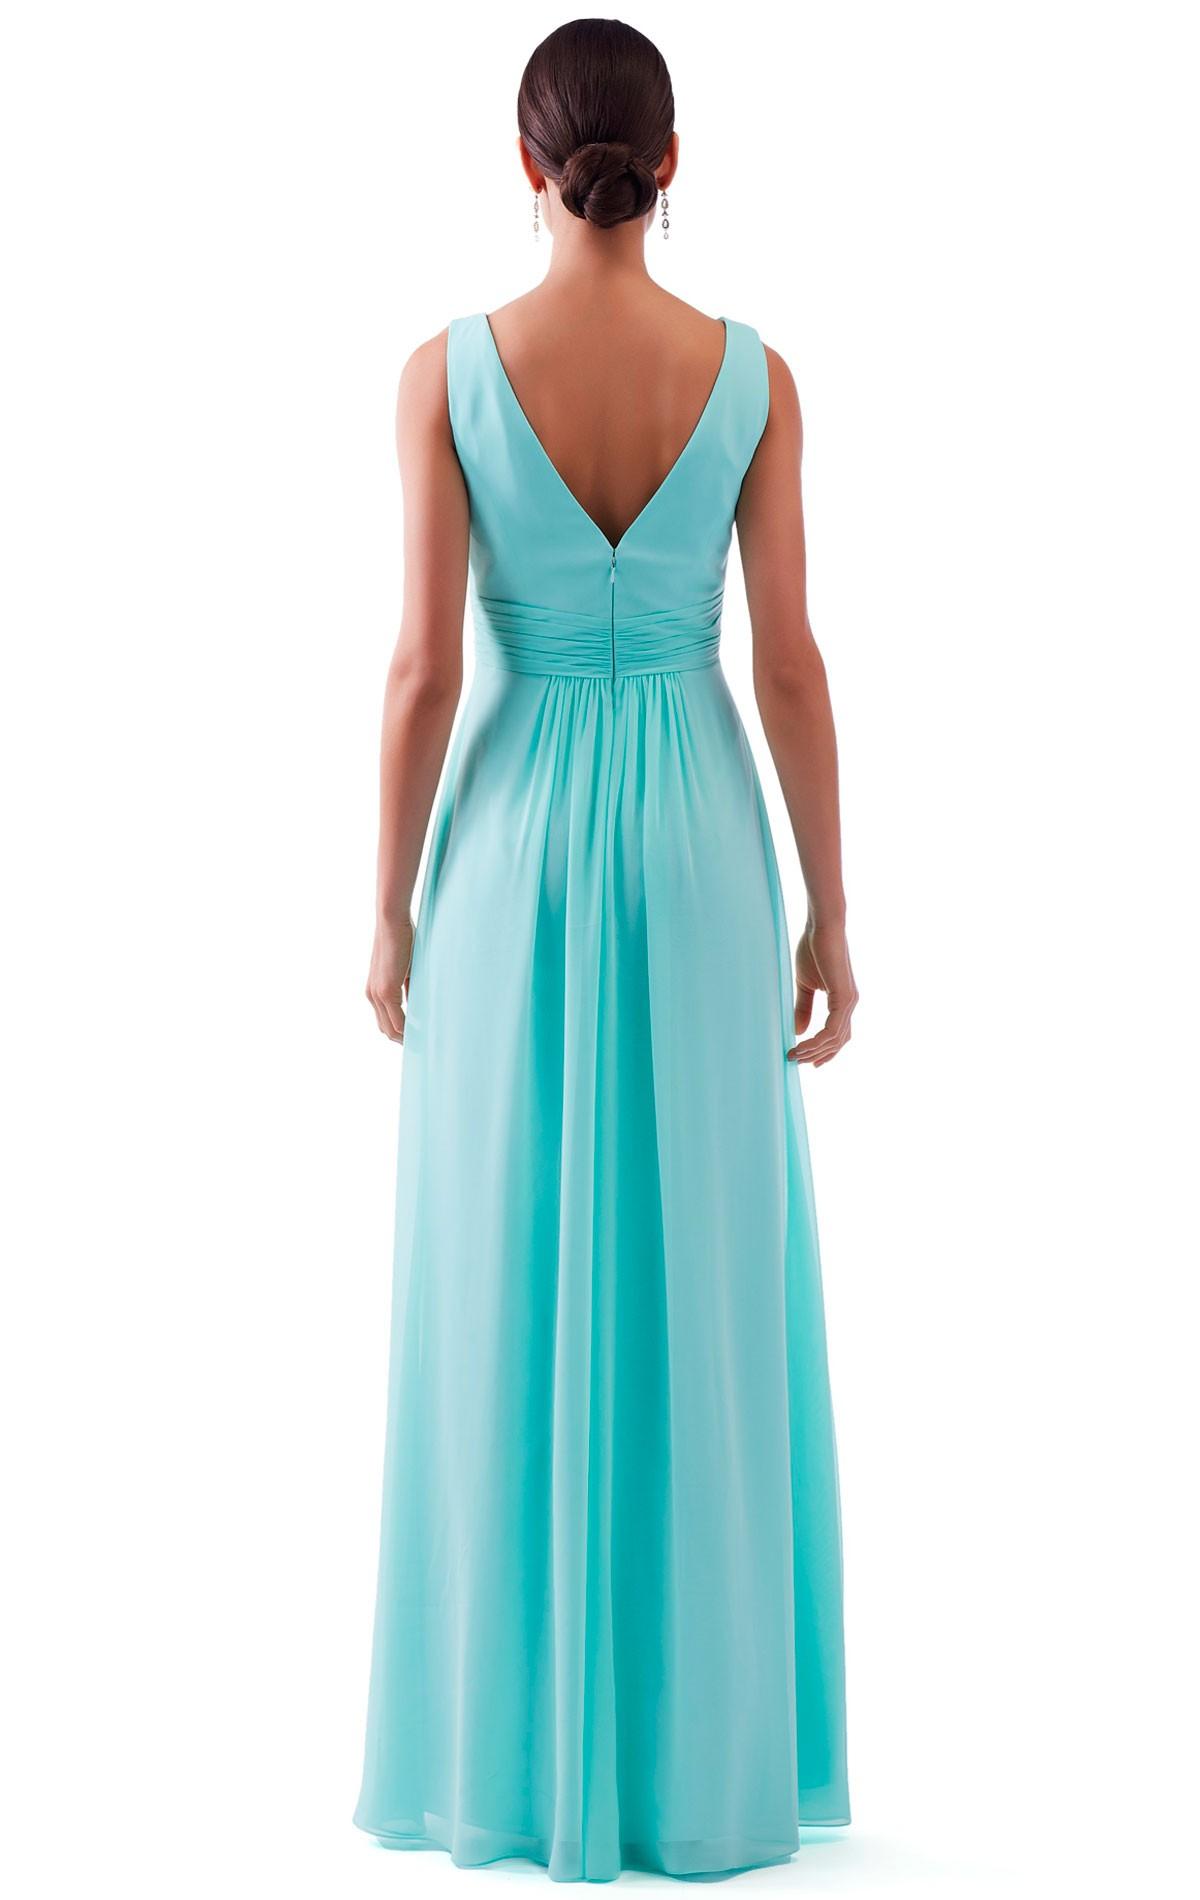 Bridesmaid dress venus bm1838 blessings of brighton bm1838 bridesmaid dress bm1838 full length mint green chiffon bridesmaid dress with v neckline ombrellifo Images